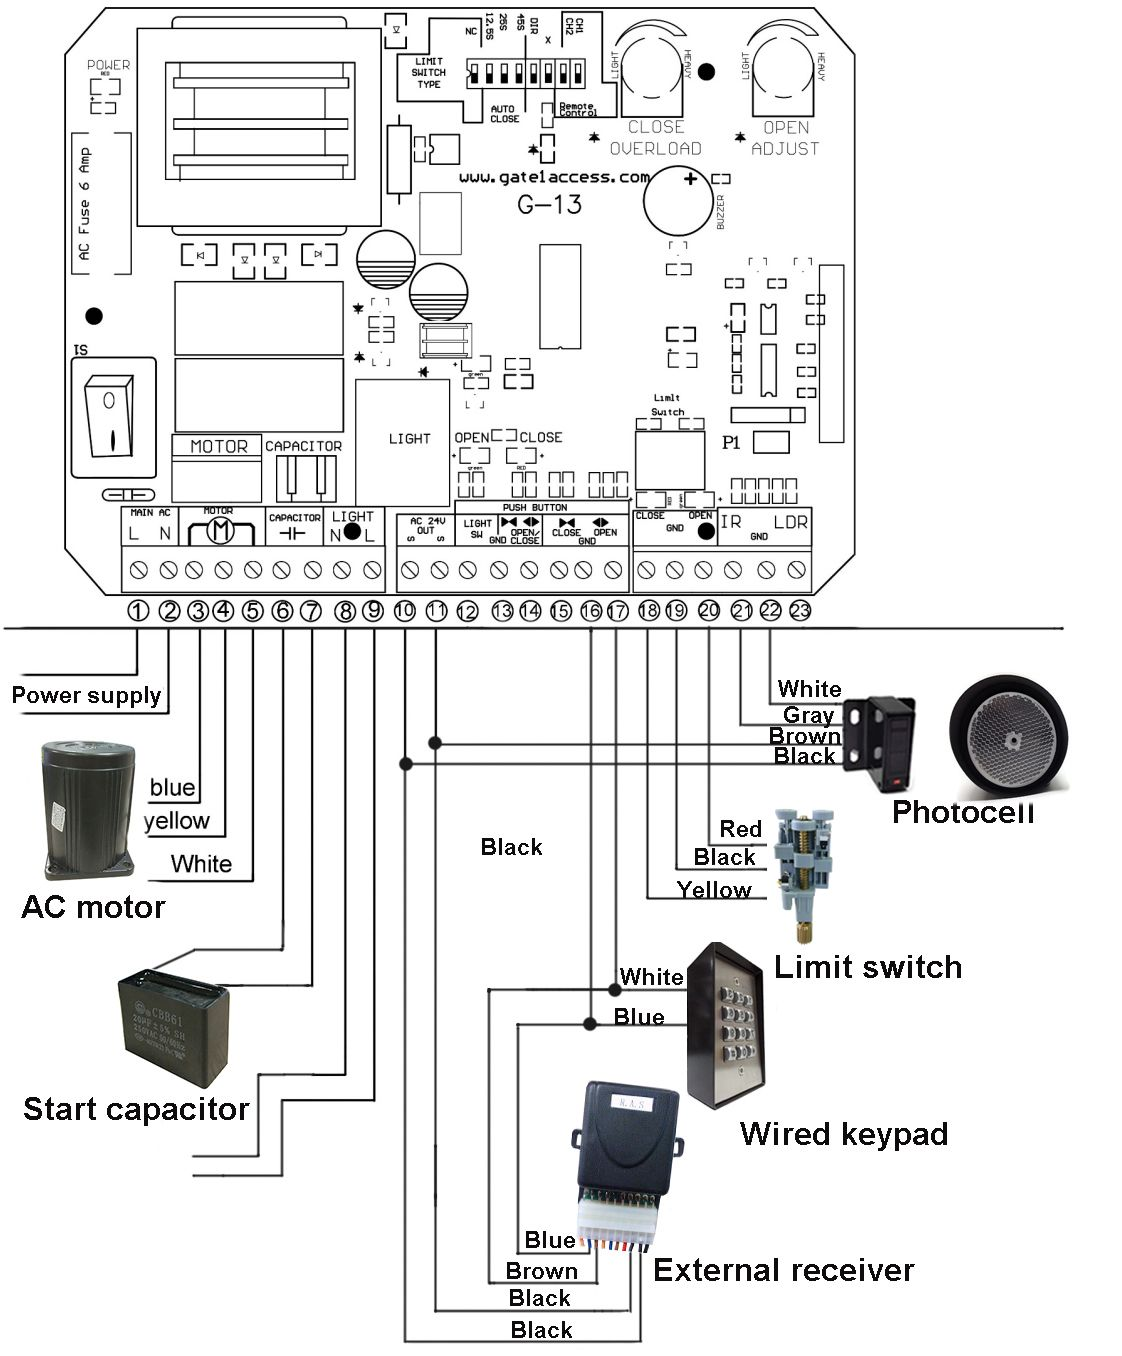 da3000 door access wiring diagram 1996 ford explorer transmission gate1 ga13 circuit board connections 40